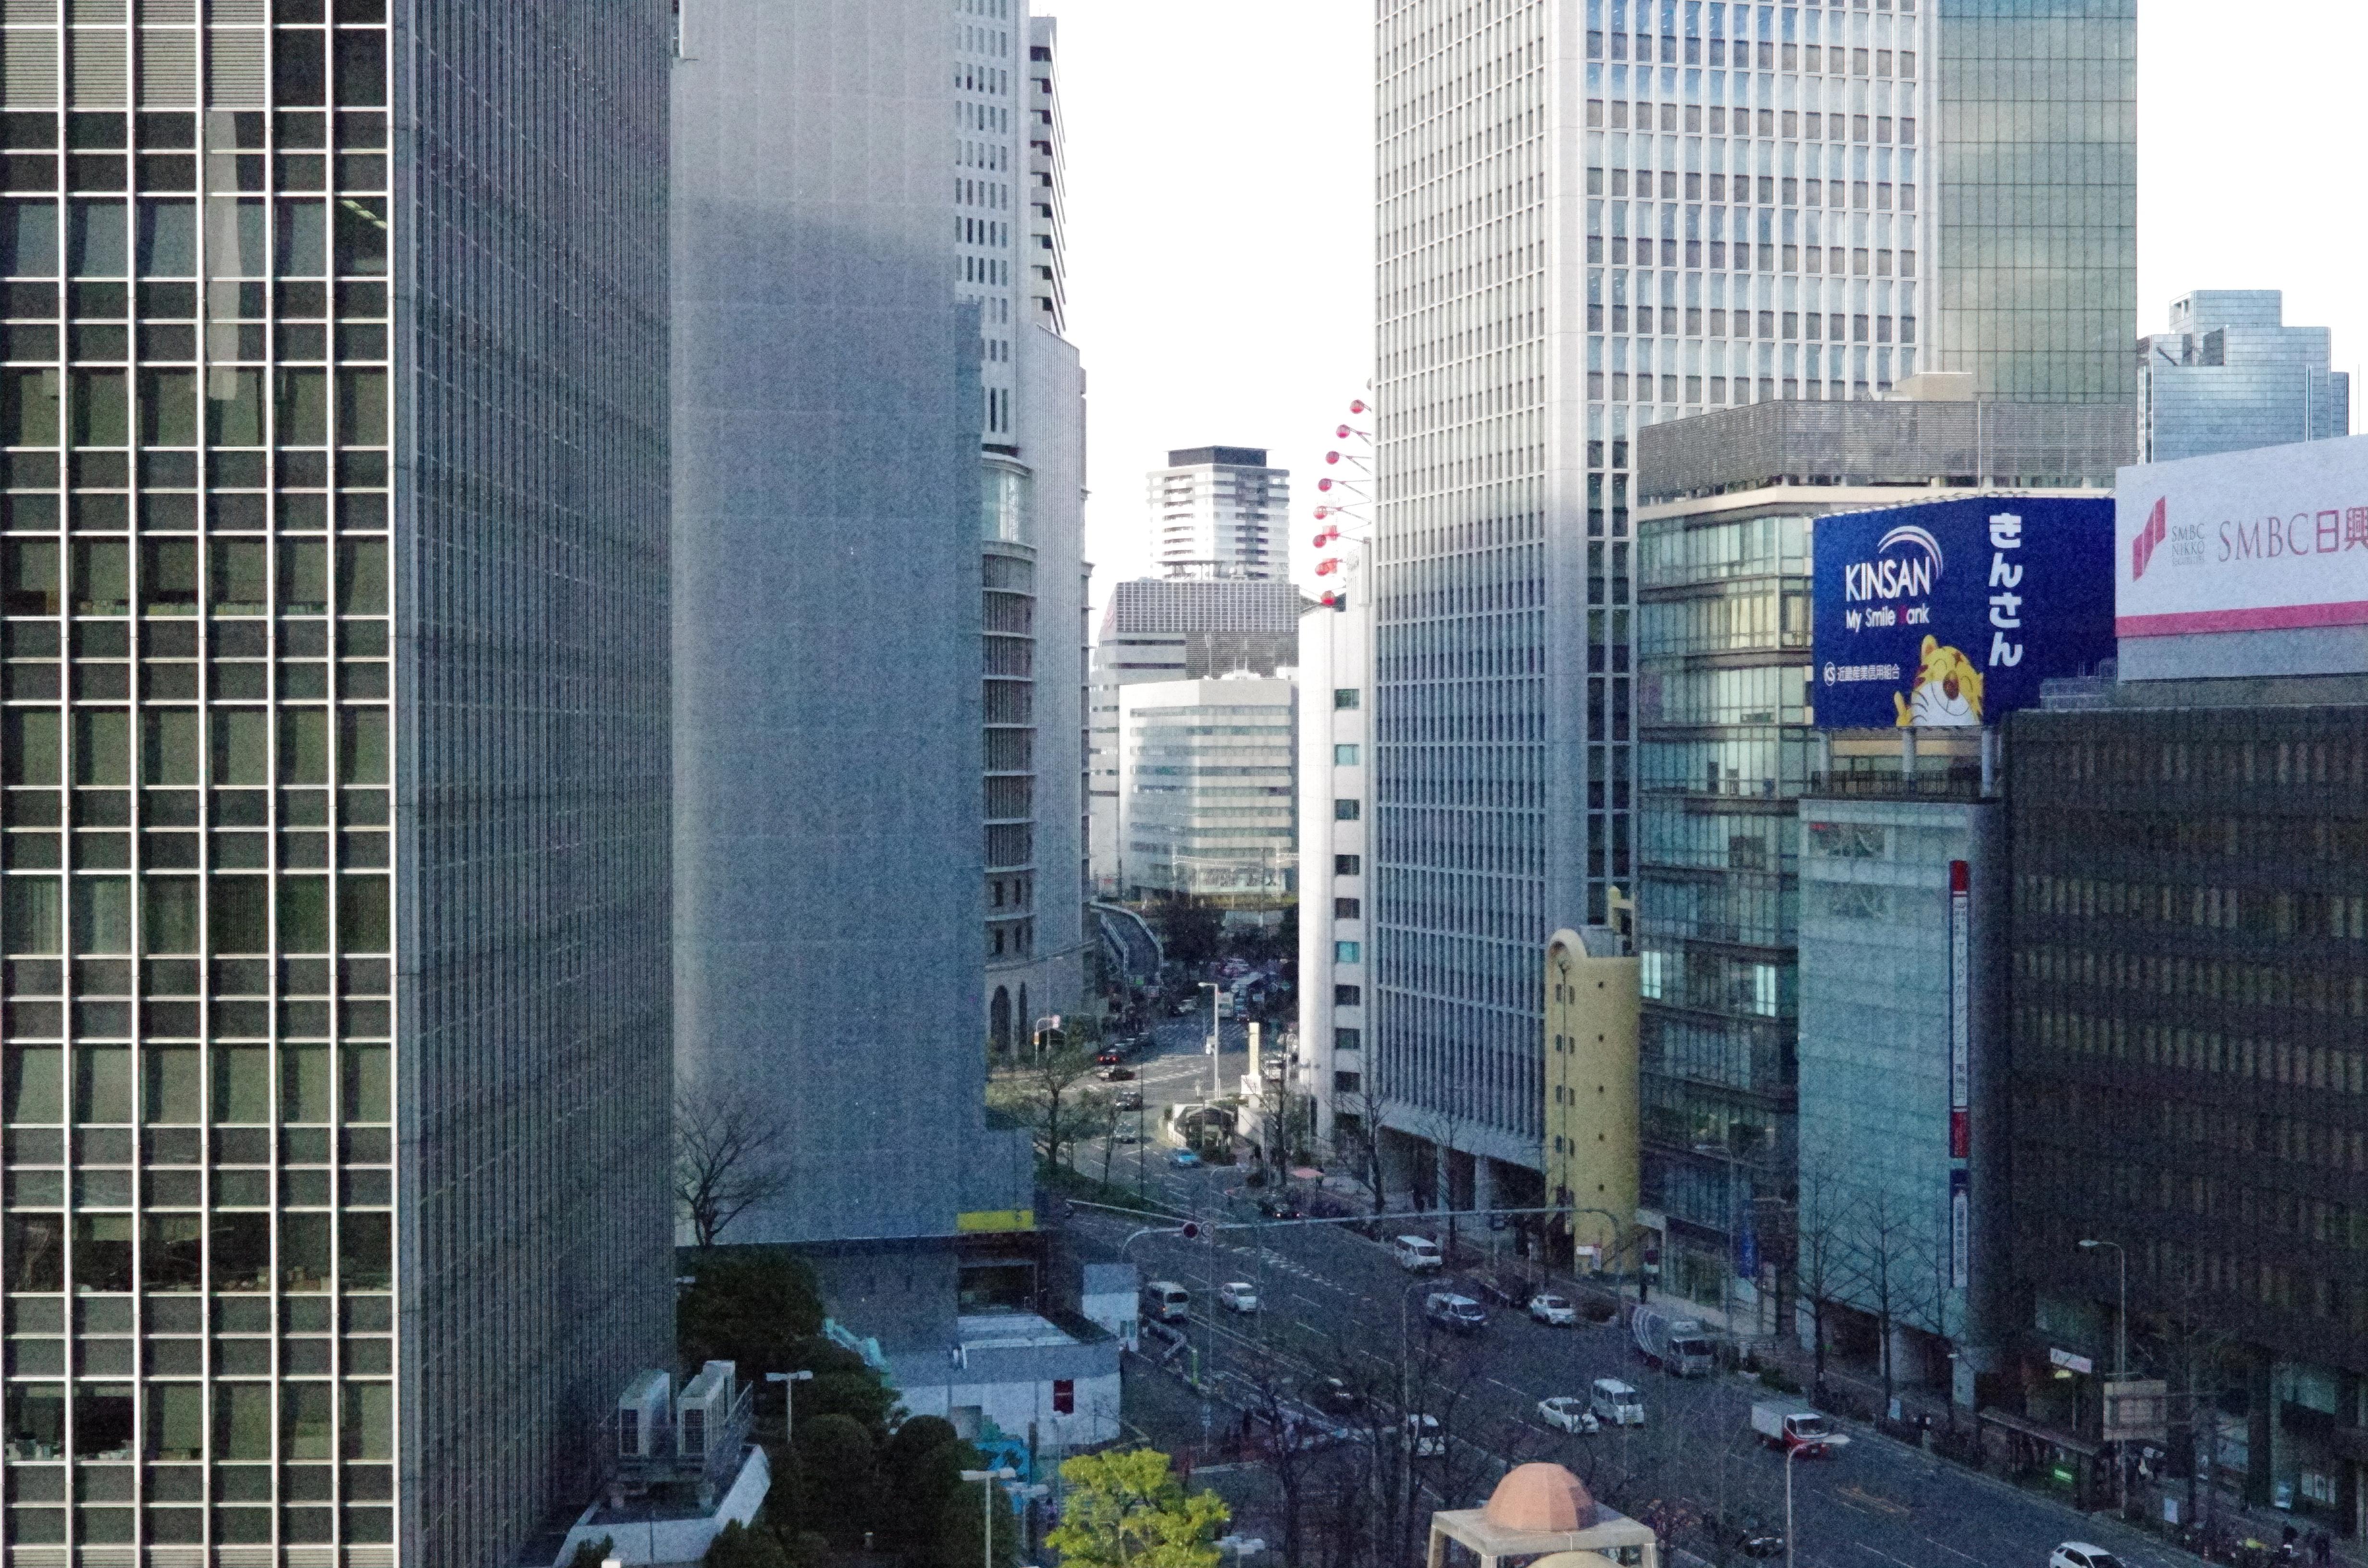 http://www.yaotomi.co.jp/blog/used/K5IIS-25600.JPG